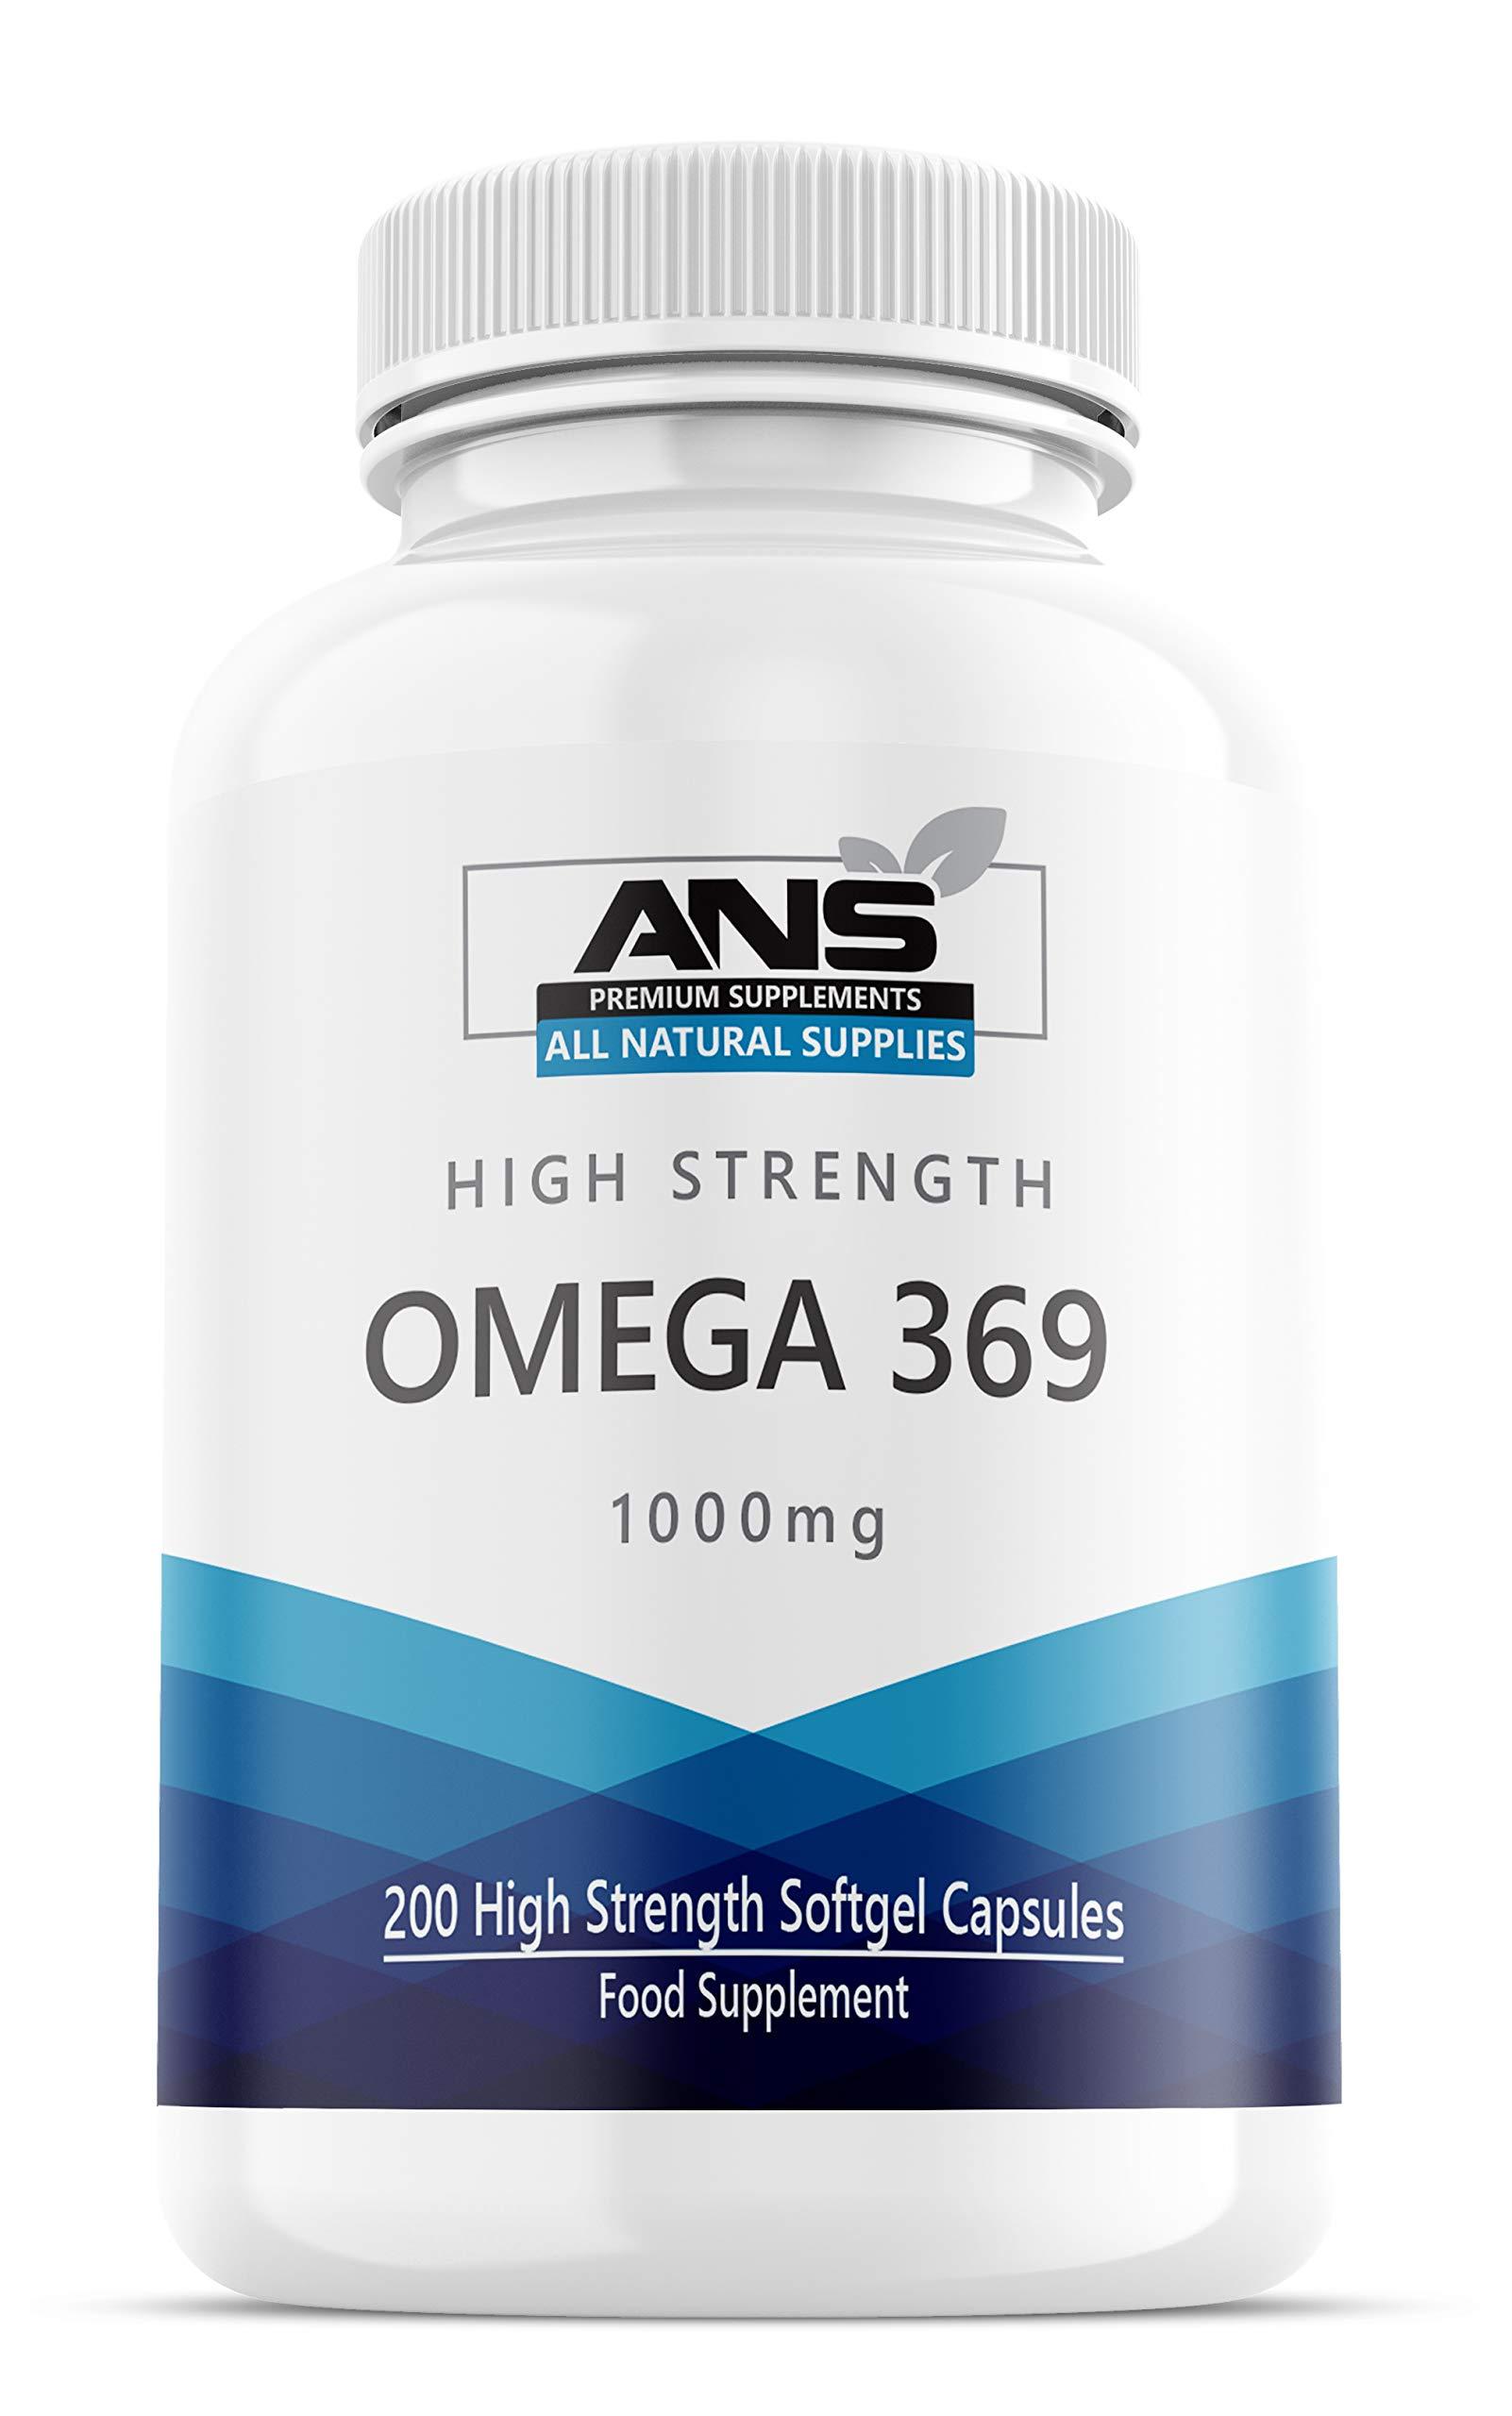 All Natural Omega 3 6 & 9, Pack of 200 1000mg High Strength Liquid softgels